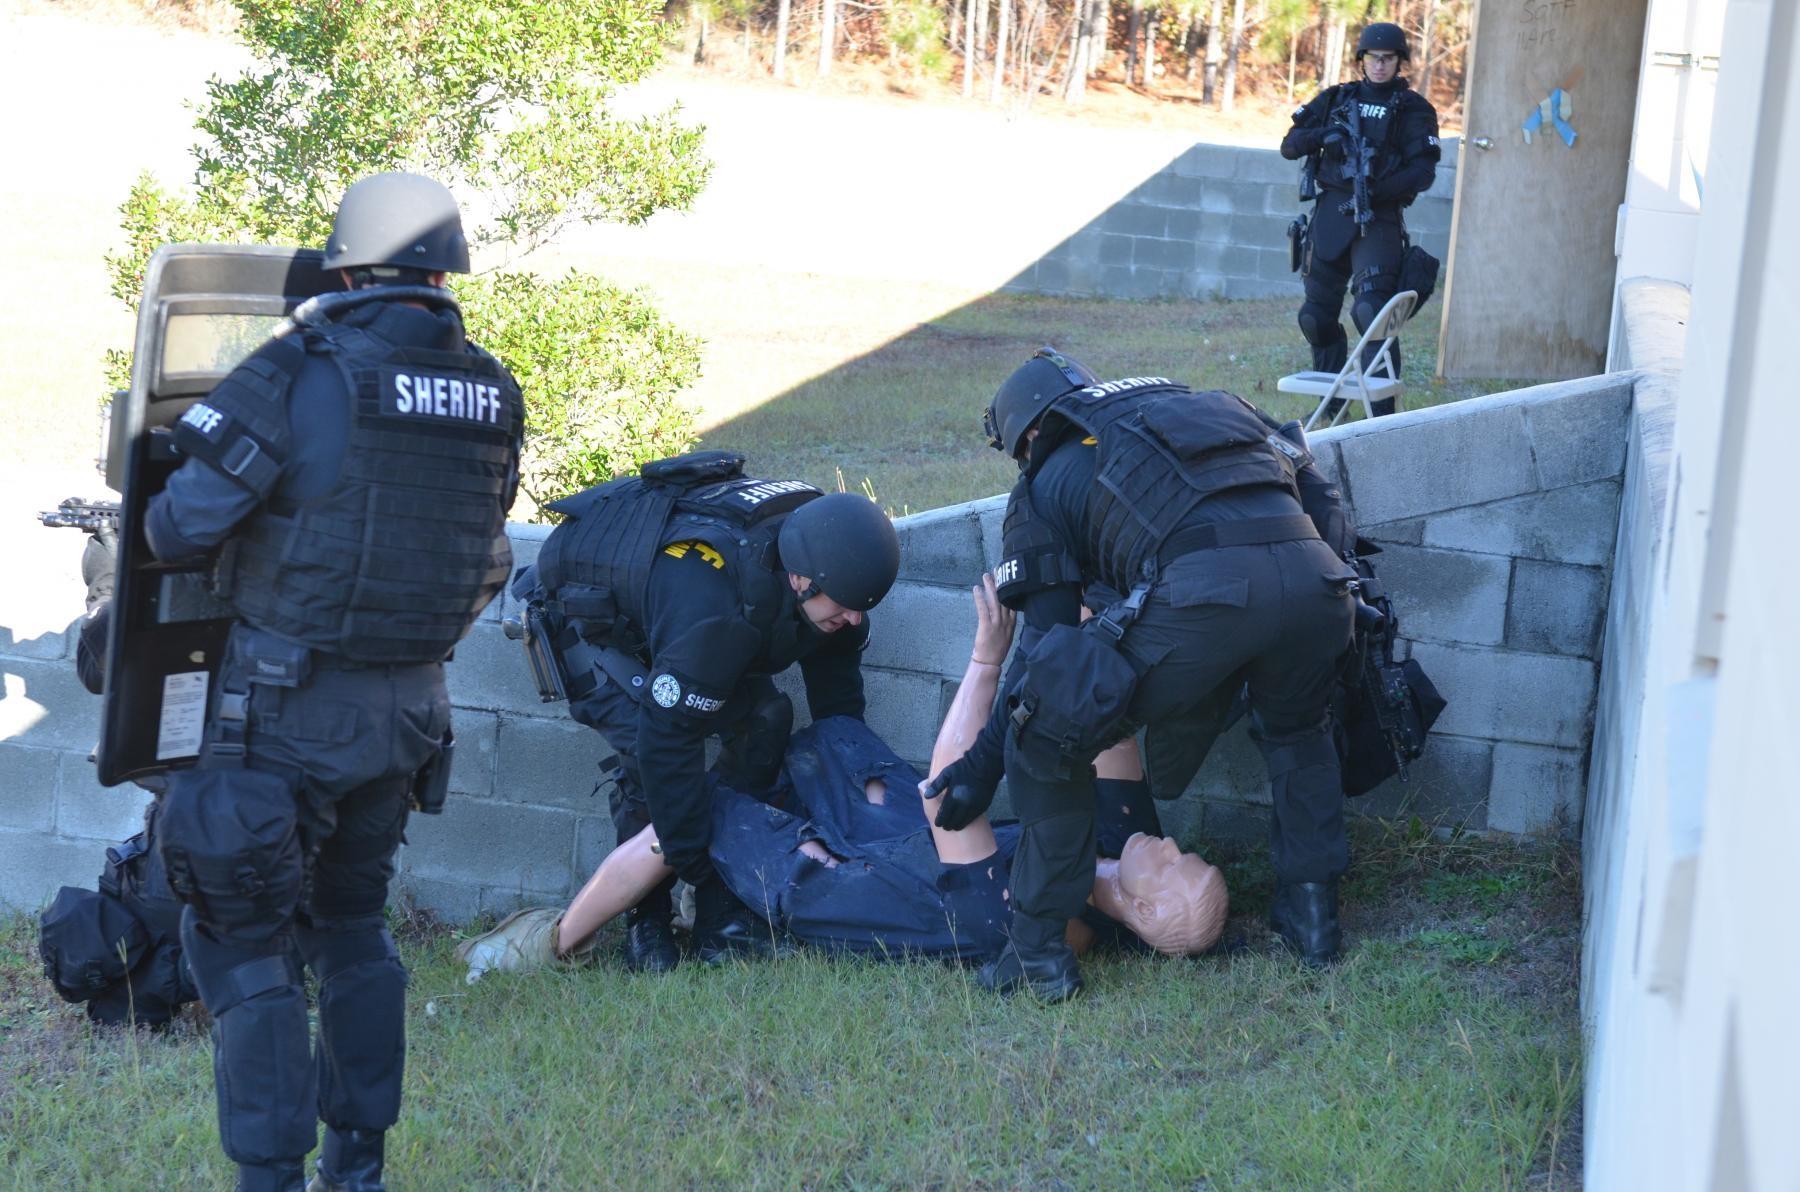 Law enforcement teams conduct collaborative training